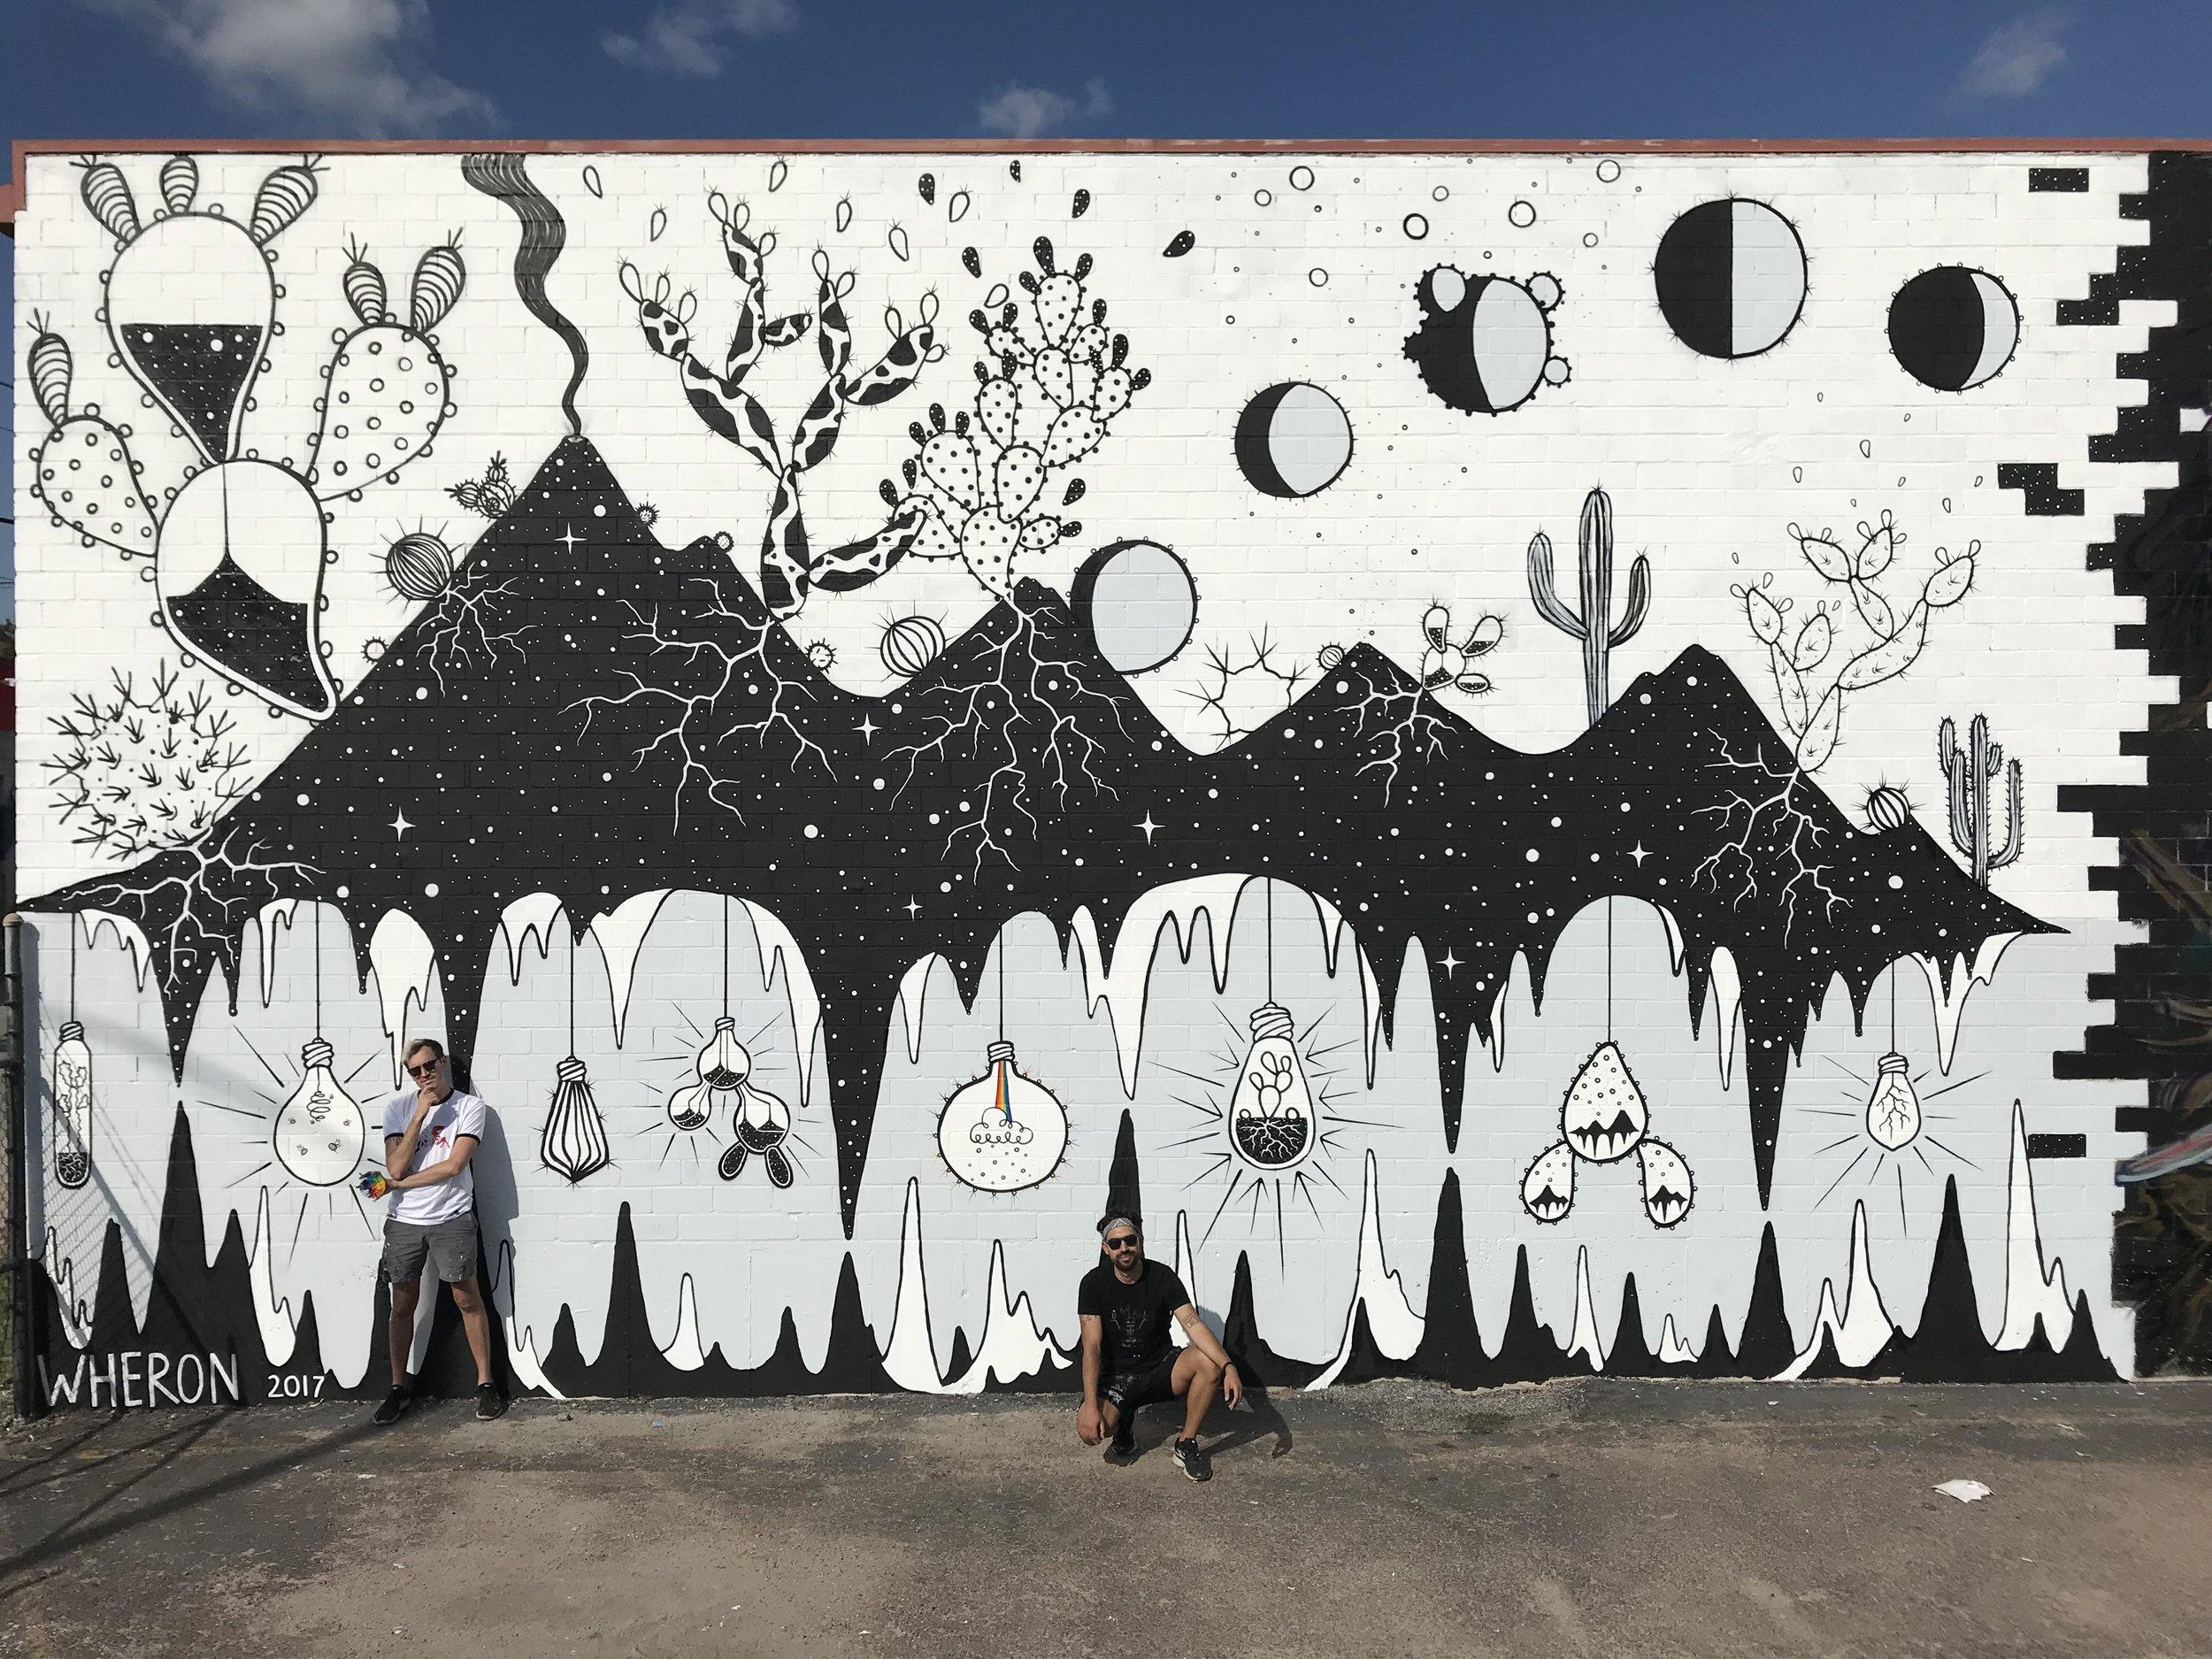 Illuminature   Houston, TX. November 2017.   HUE Mural Festival  Participating Artist